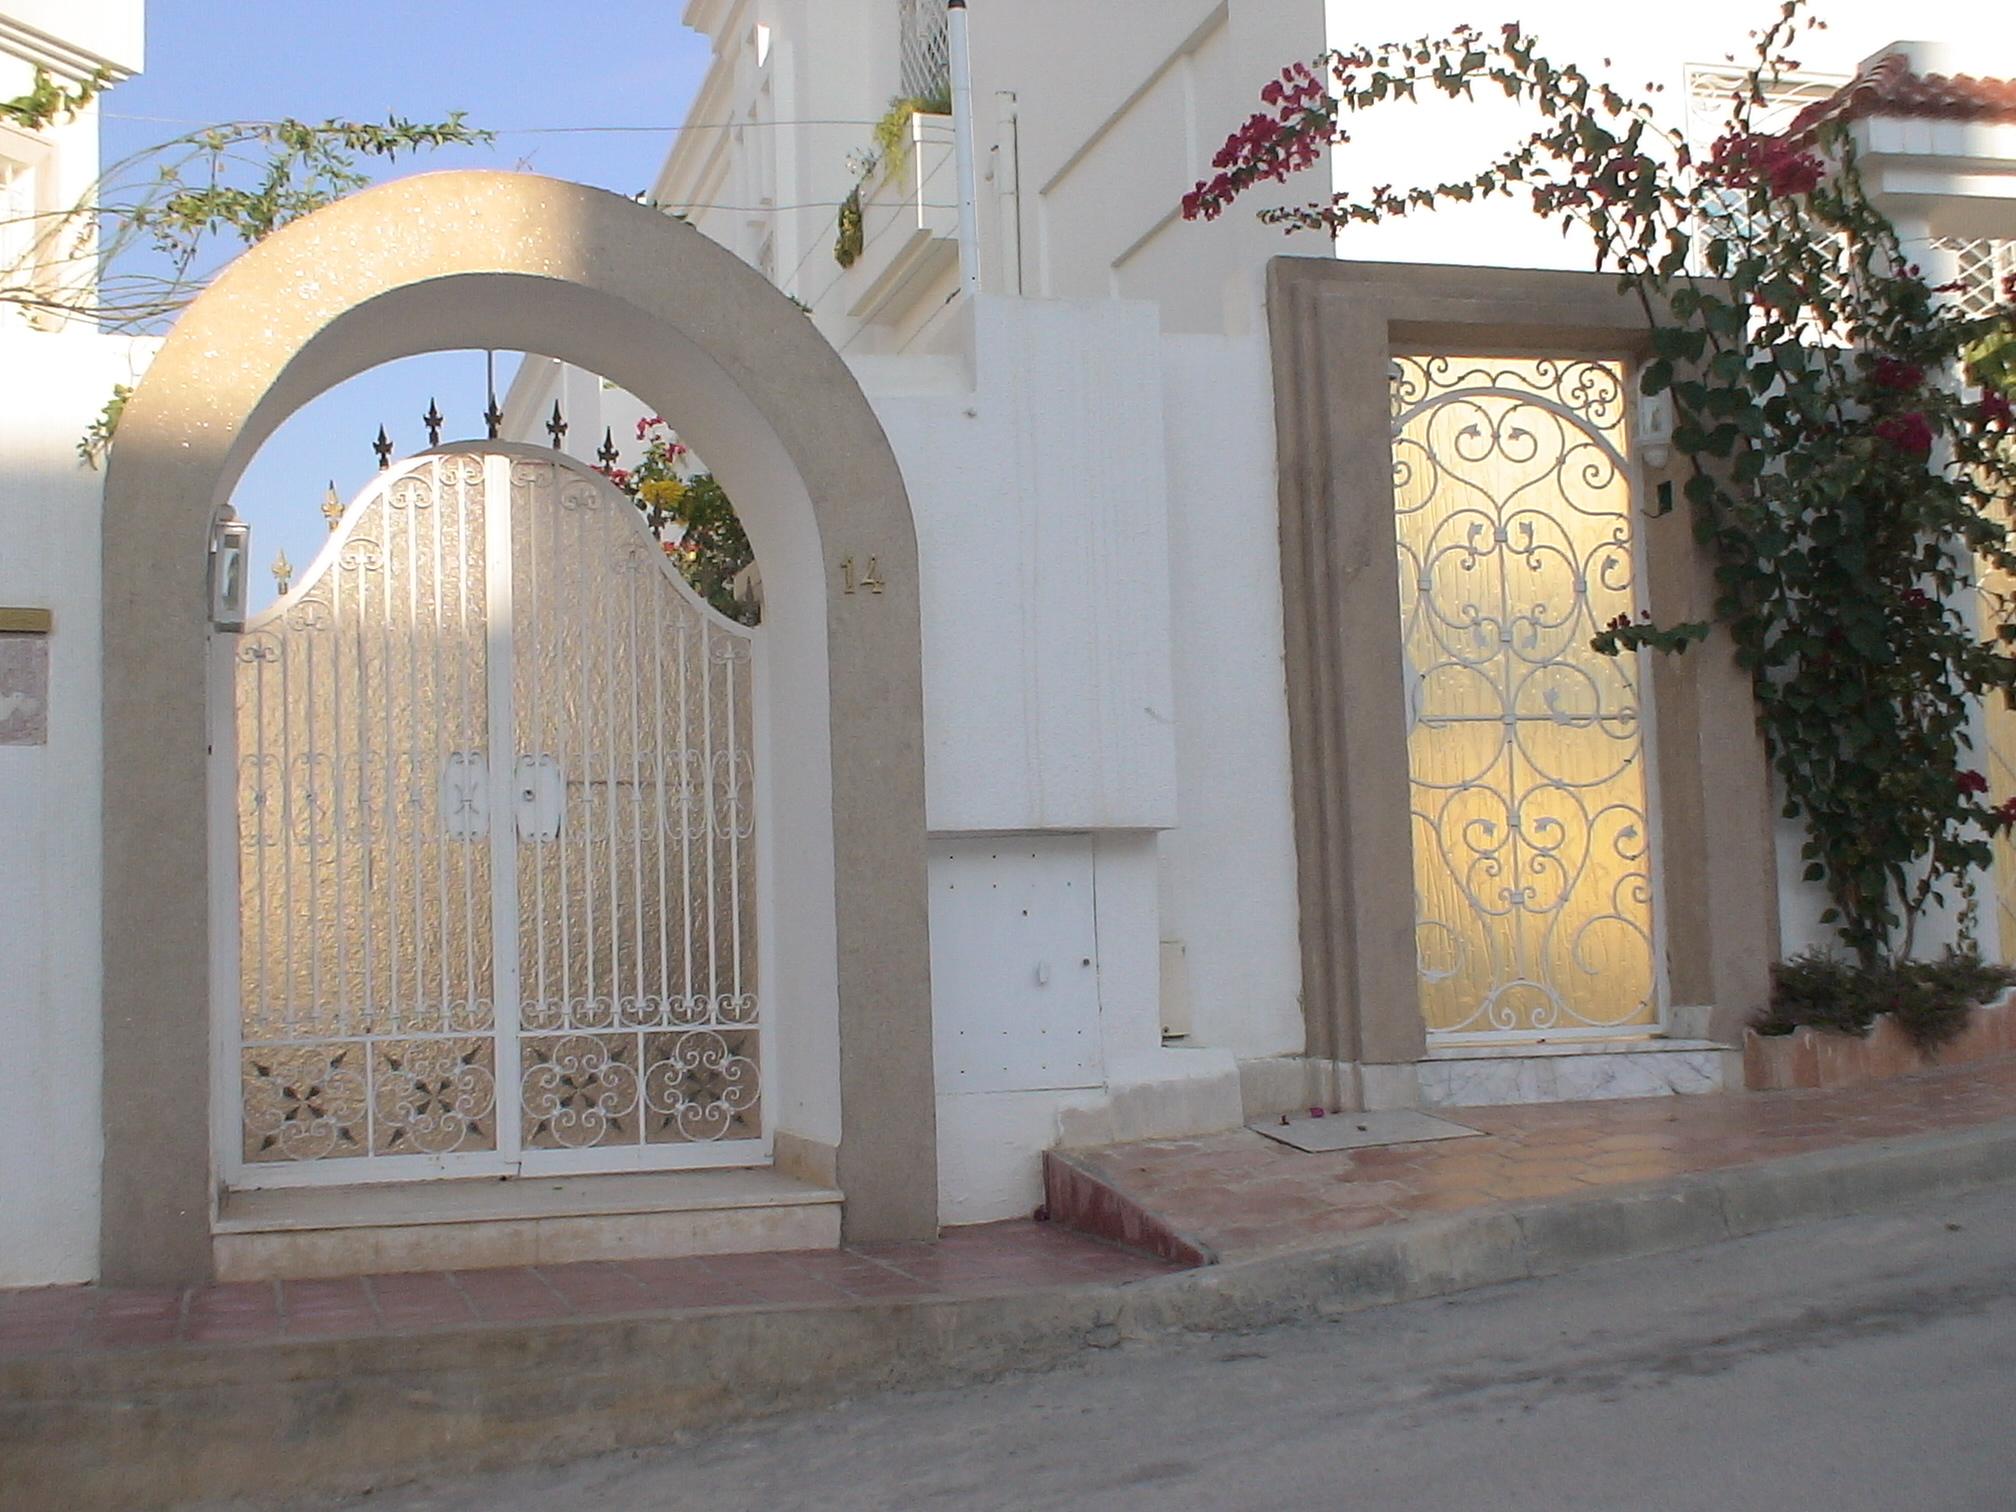 Porte ext rieure en fer forg tunis maisons by for Porte fer forge en tunisie